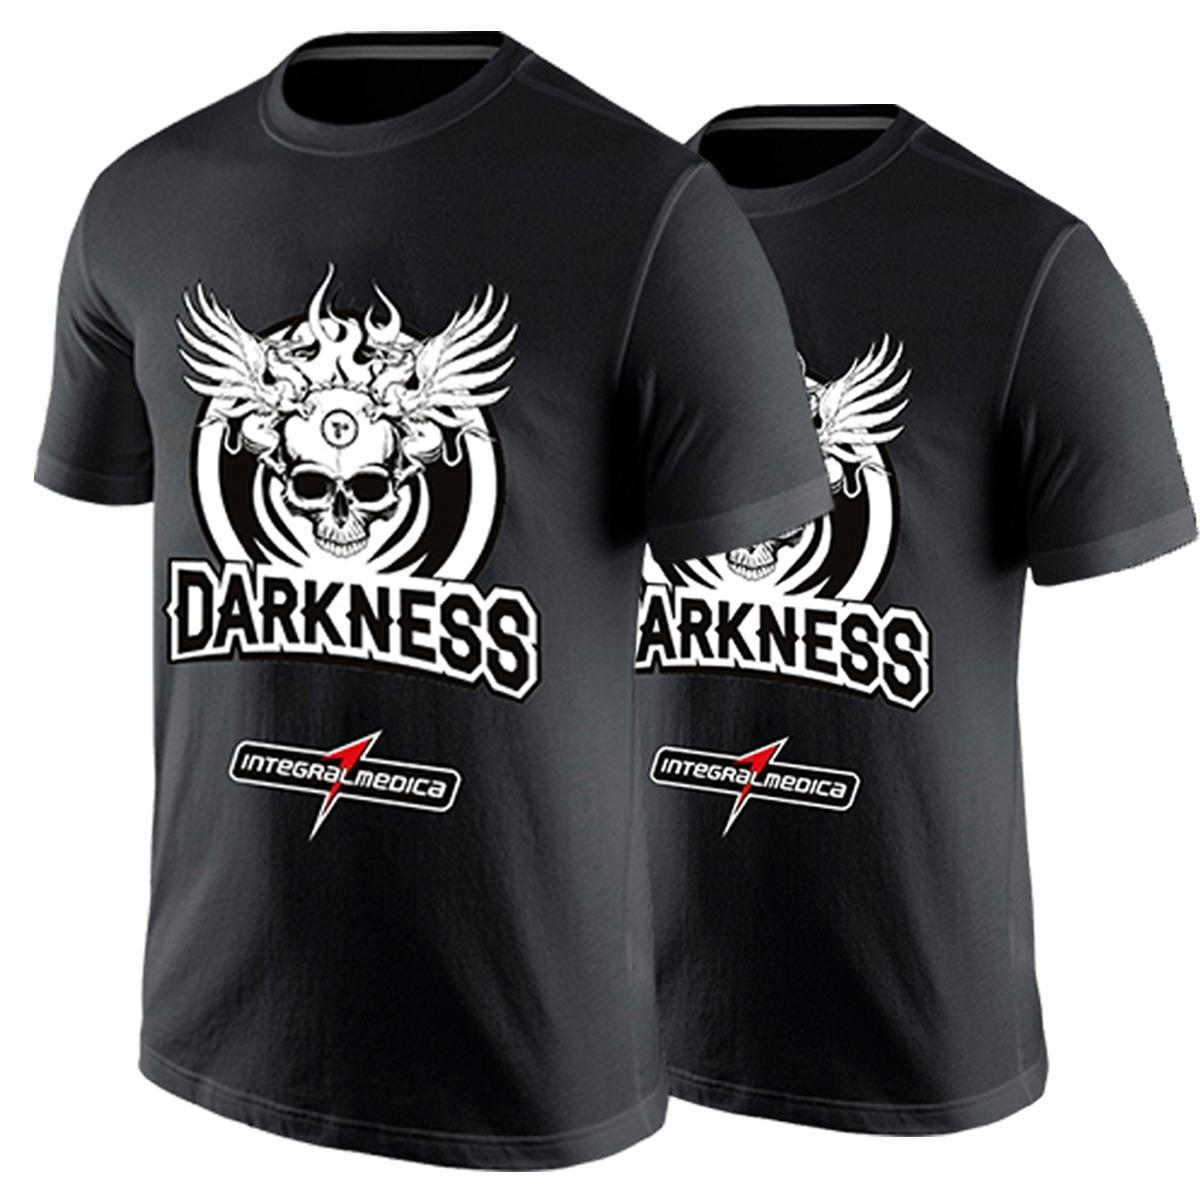 7a2fd3101 2x camisa dry fit caveira - darkness - integral. Carregando zoom.